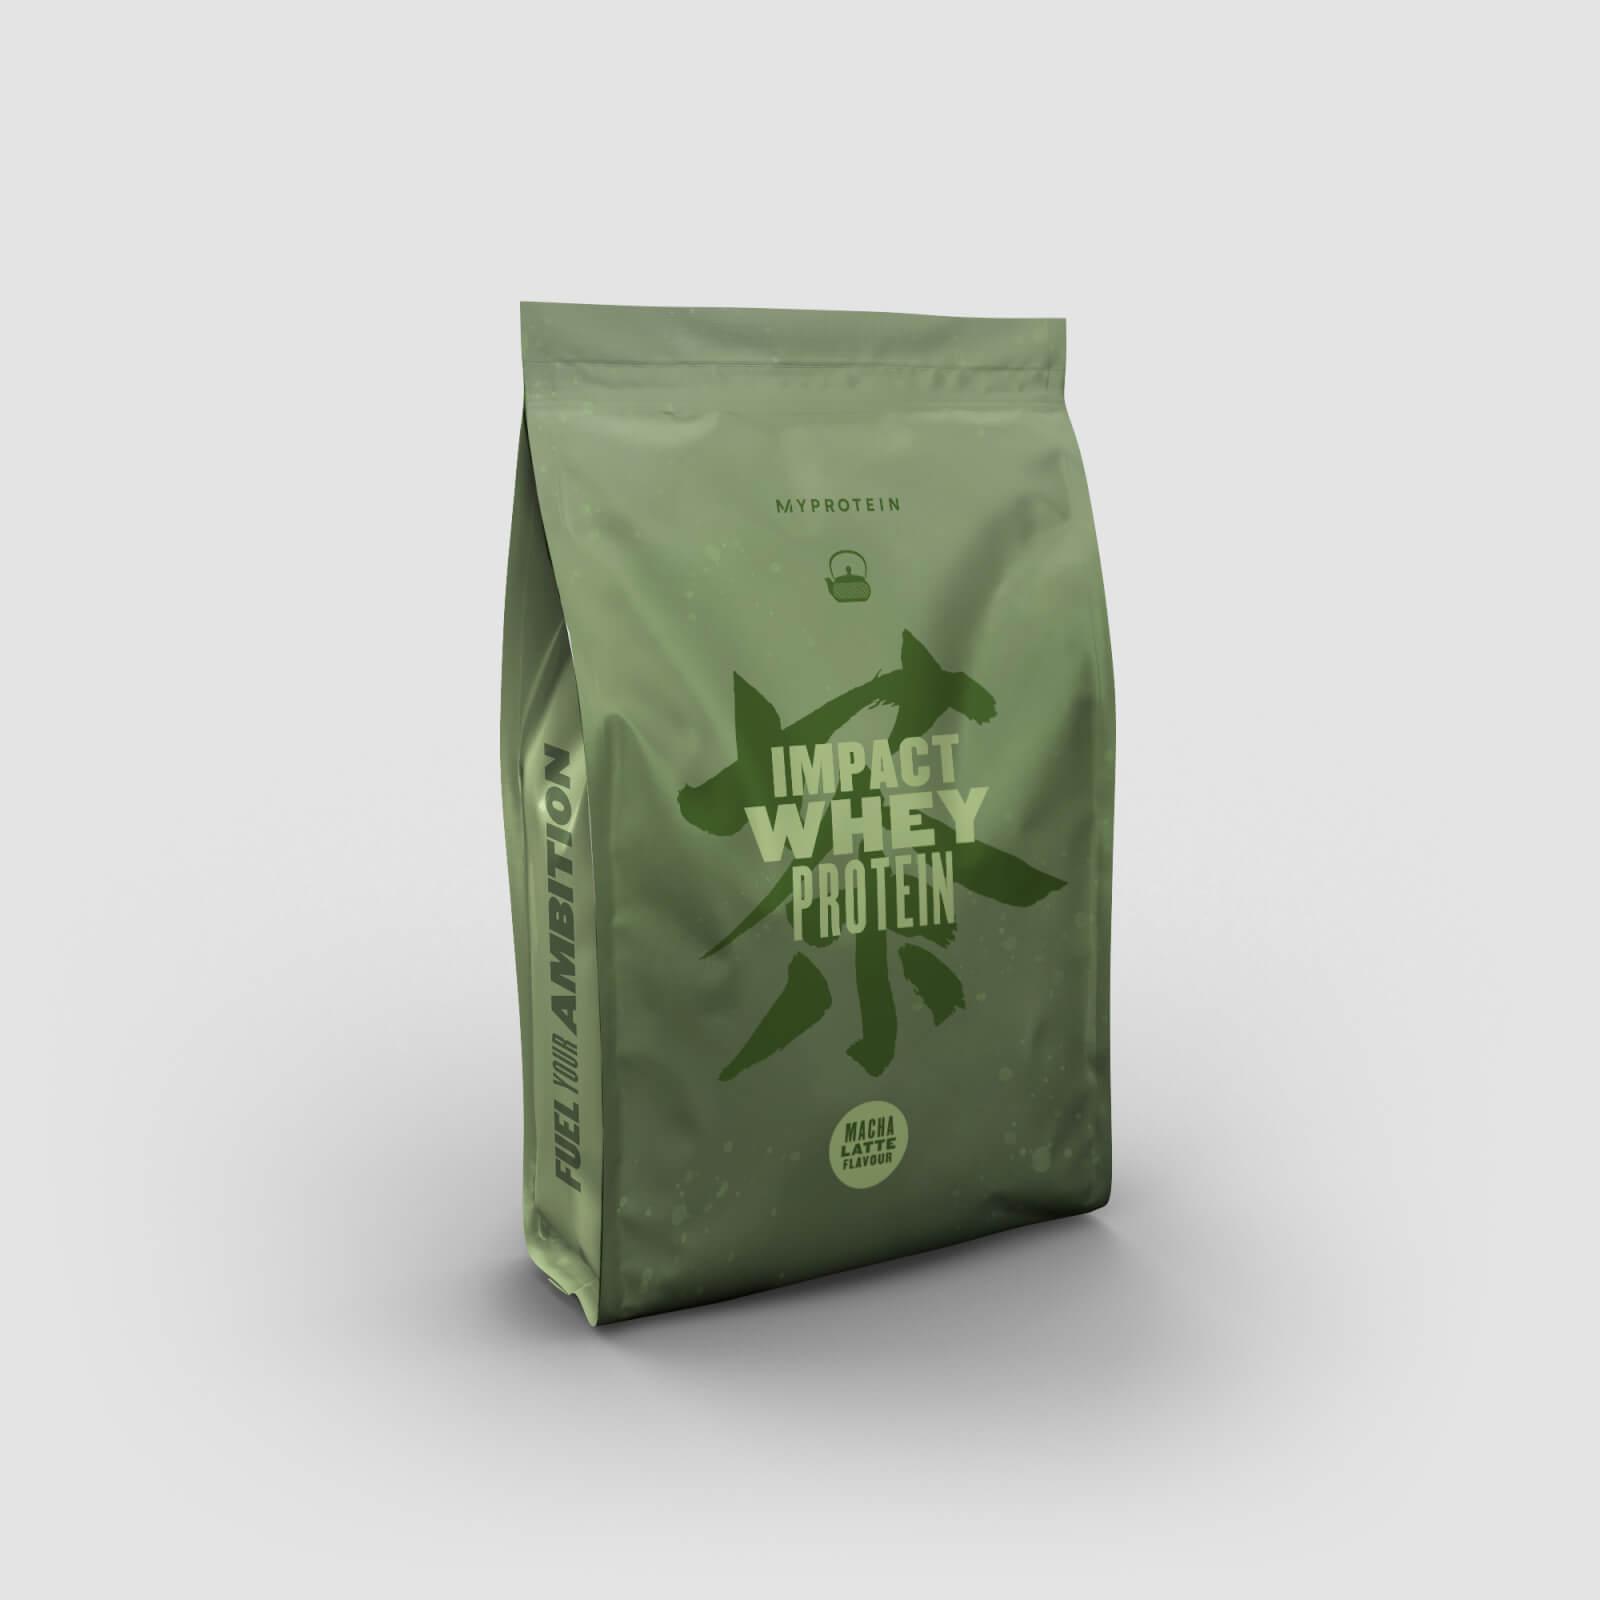 Impact Whey Protein - 1kg - Matcha Latte